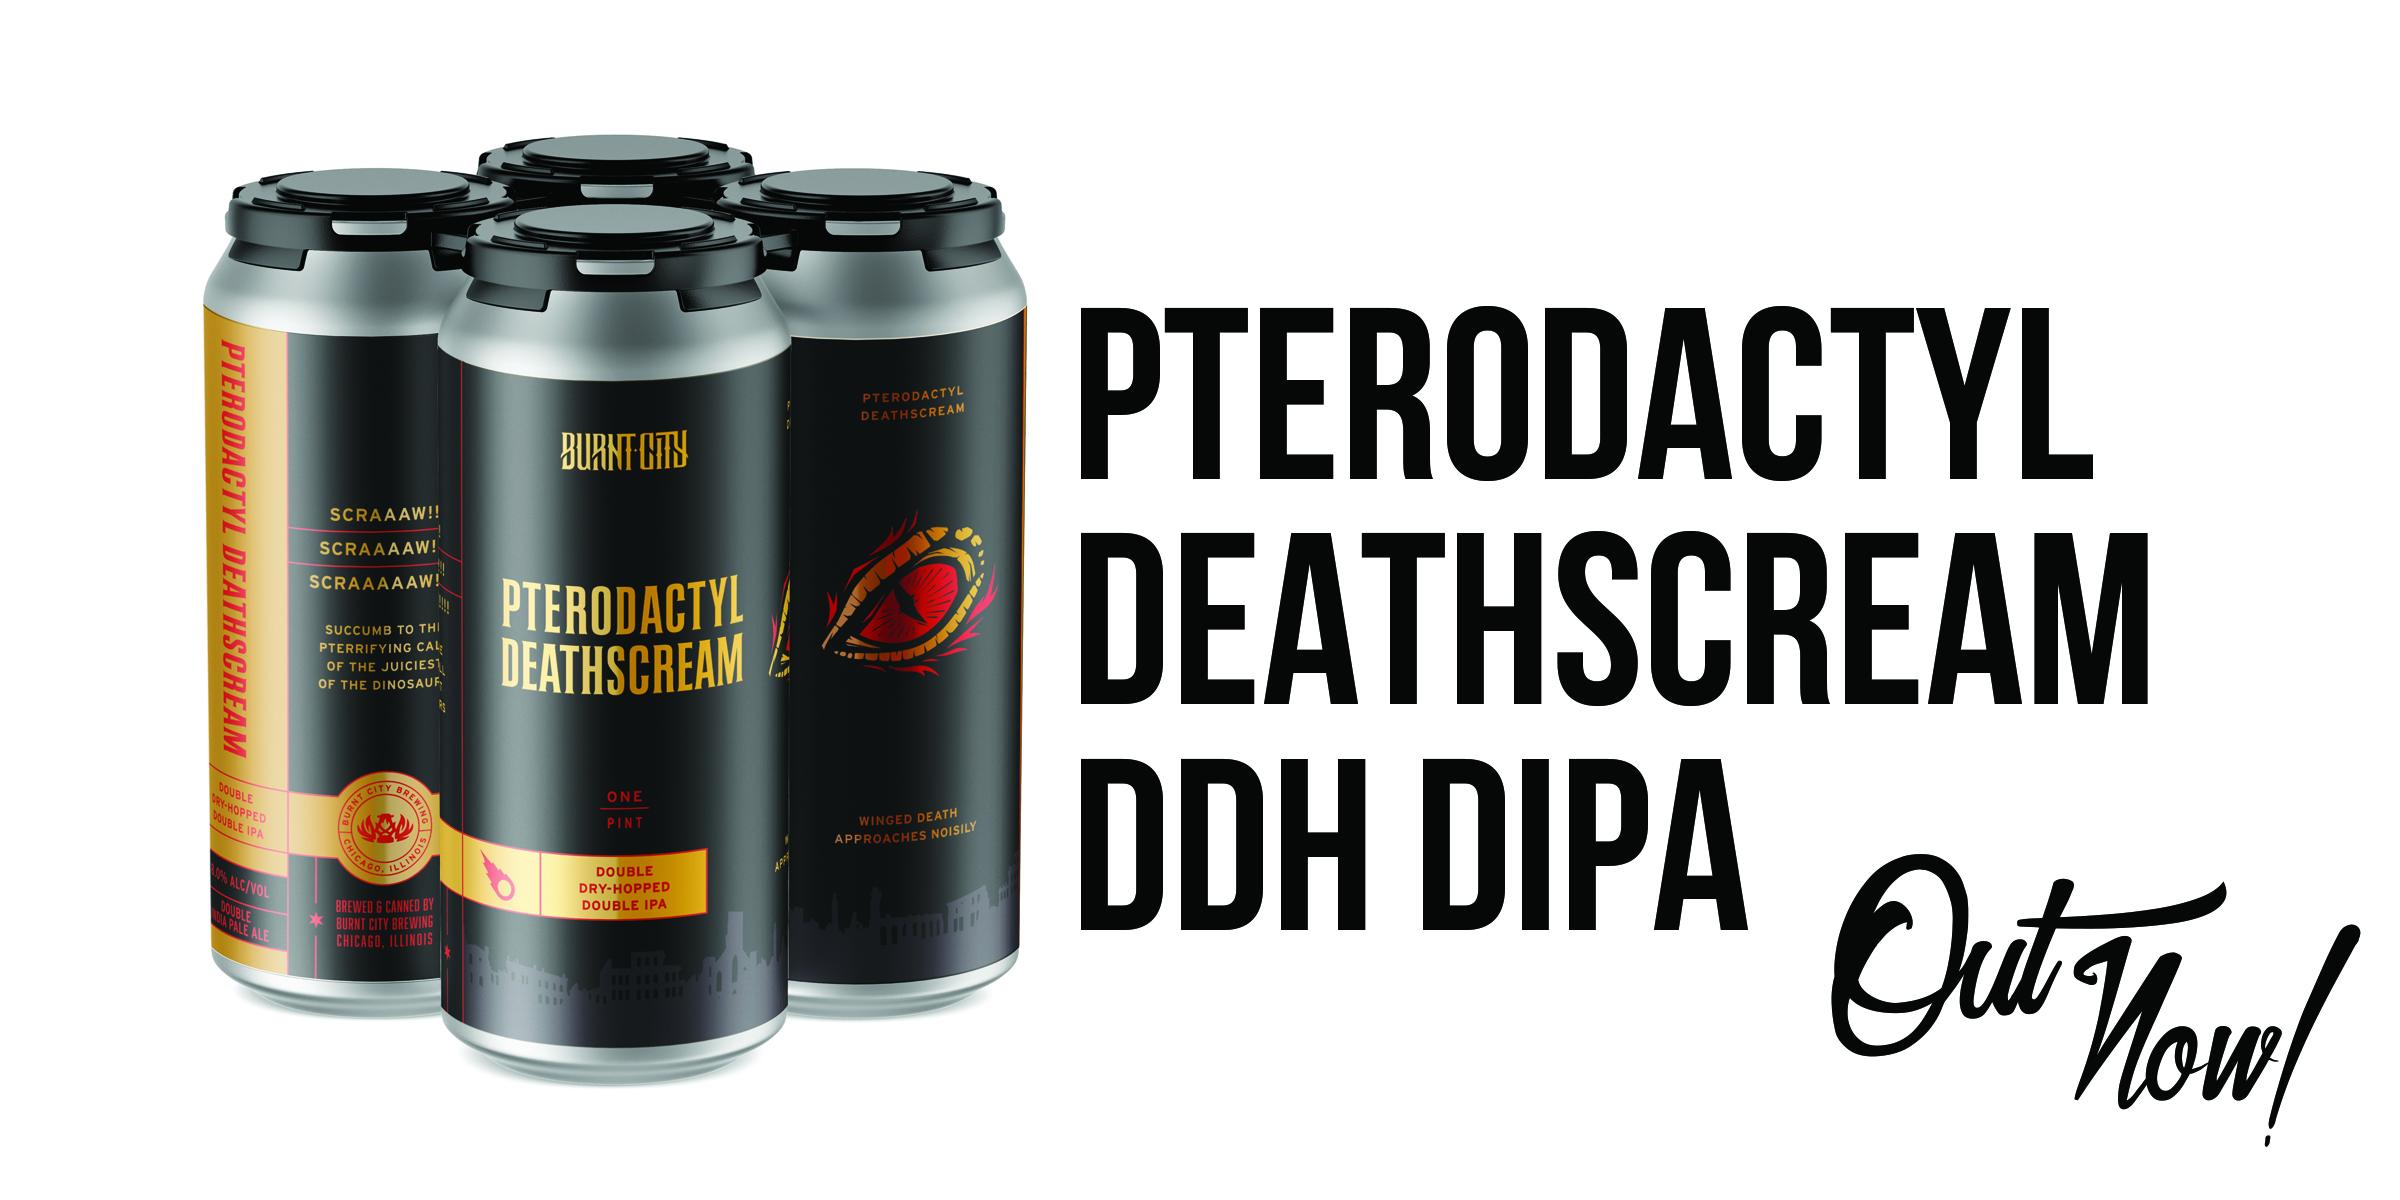 Pterodactyl Deathscream Double Dry-Hopped DIPA 16oz 4pks.